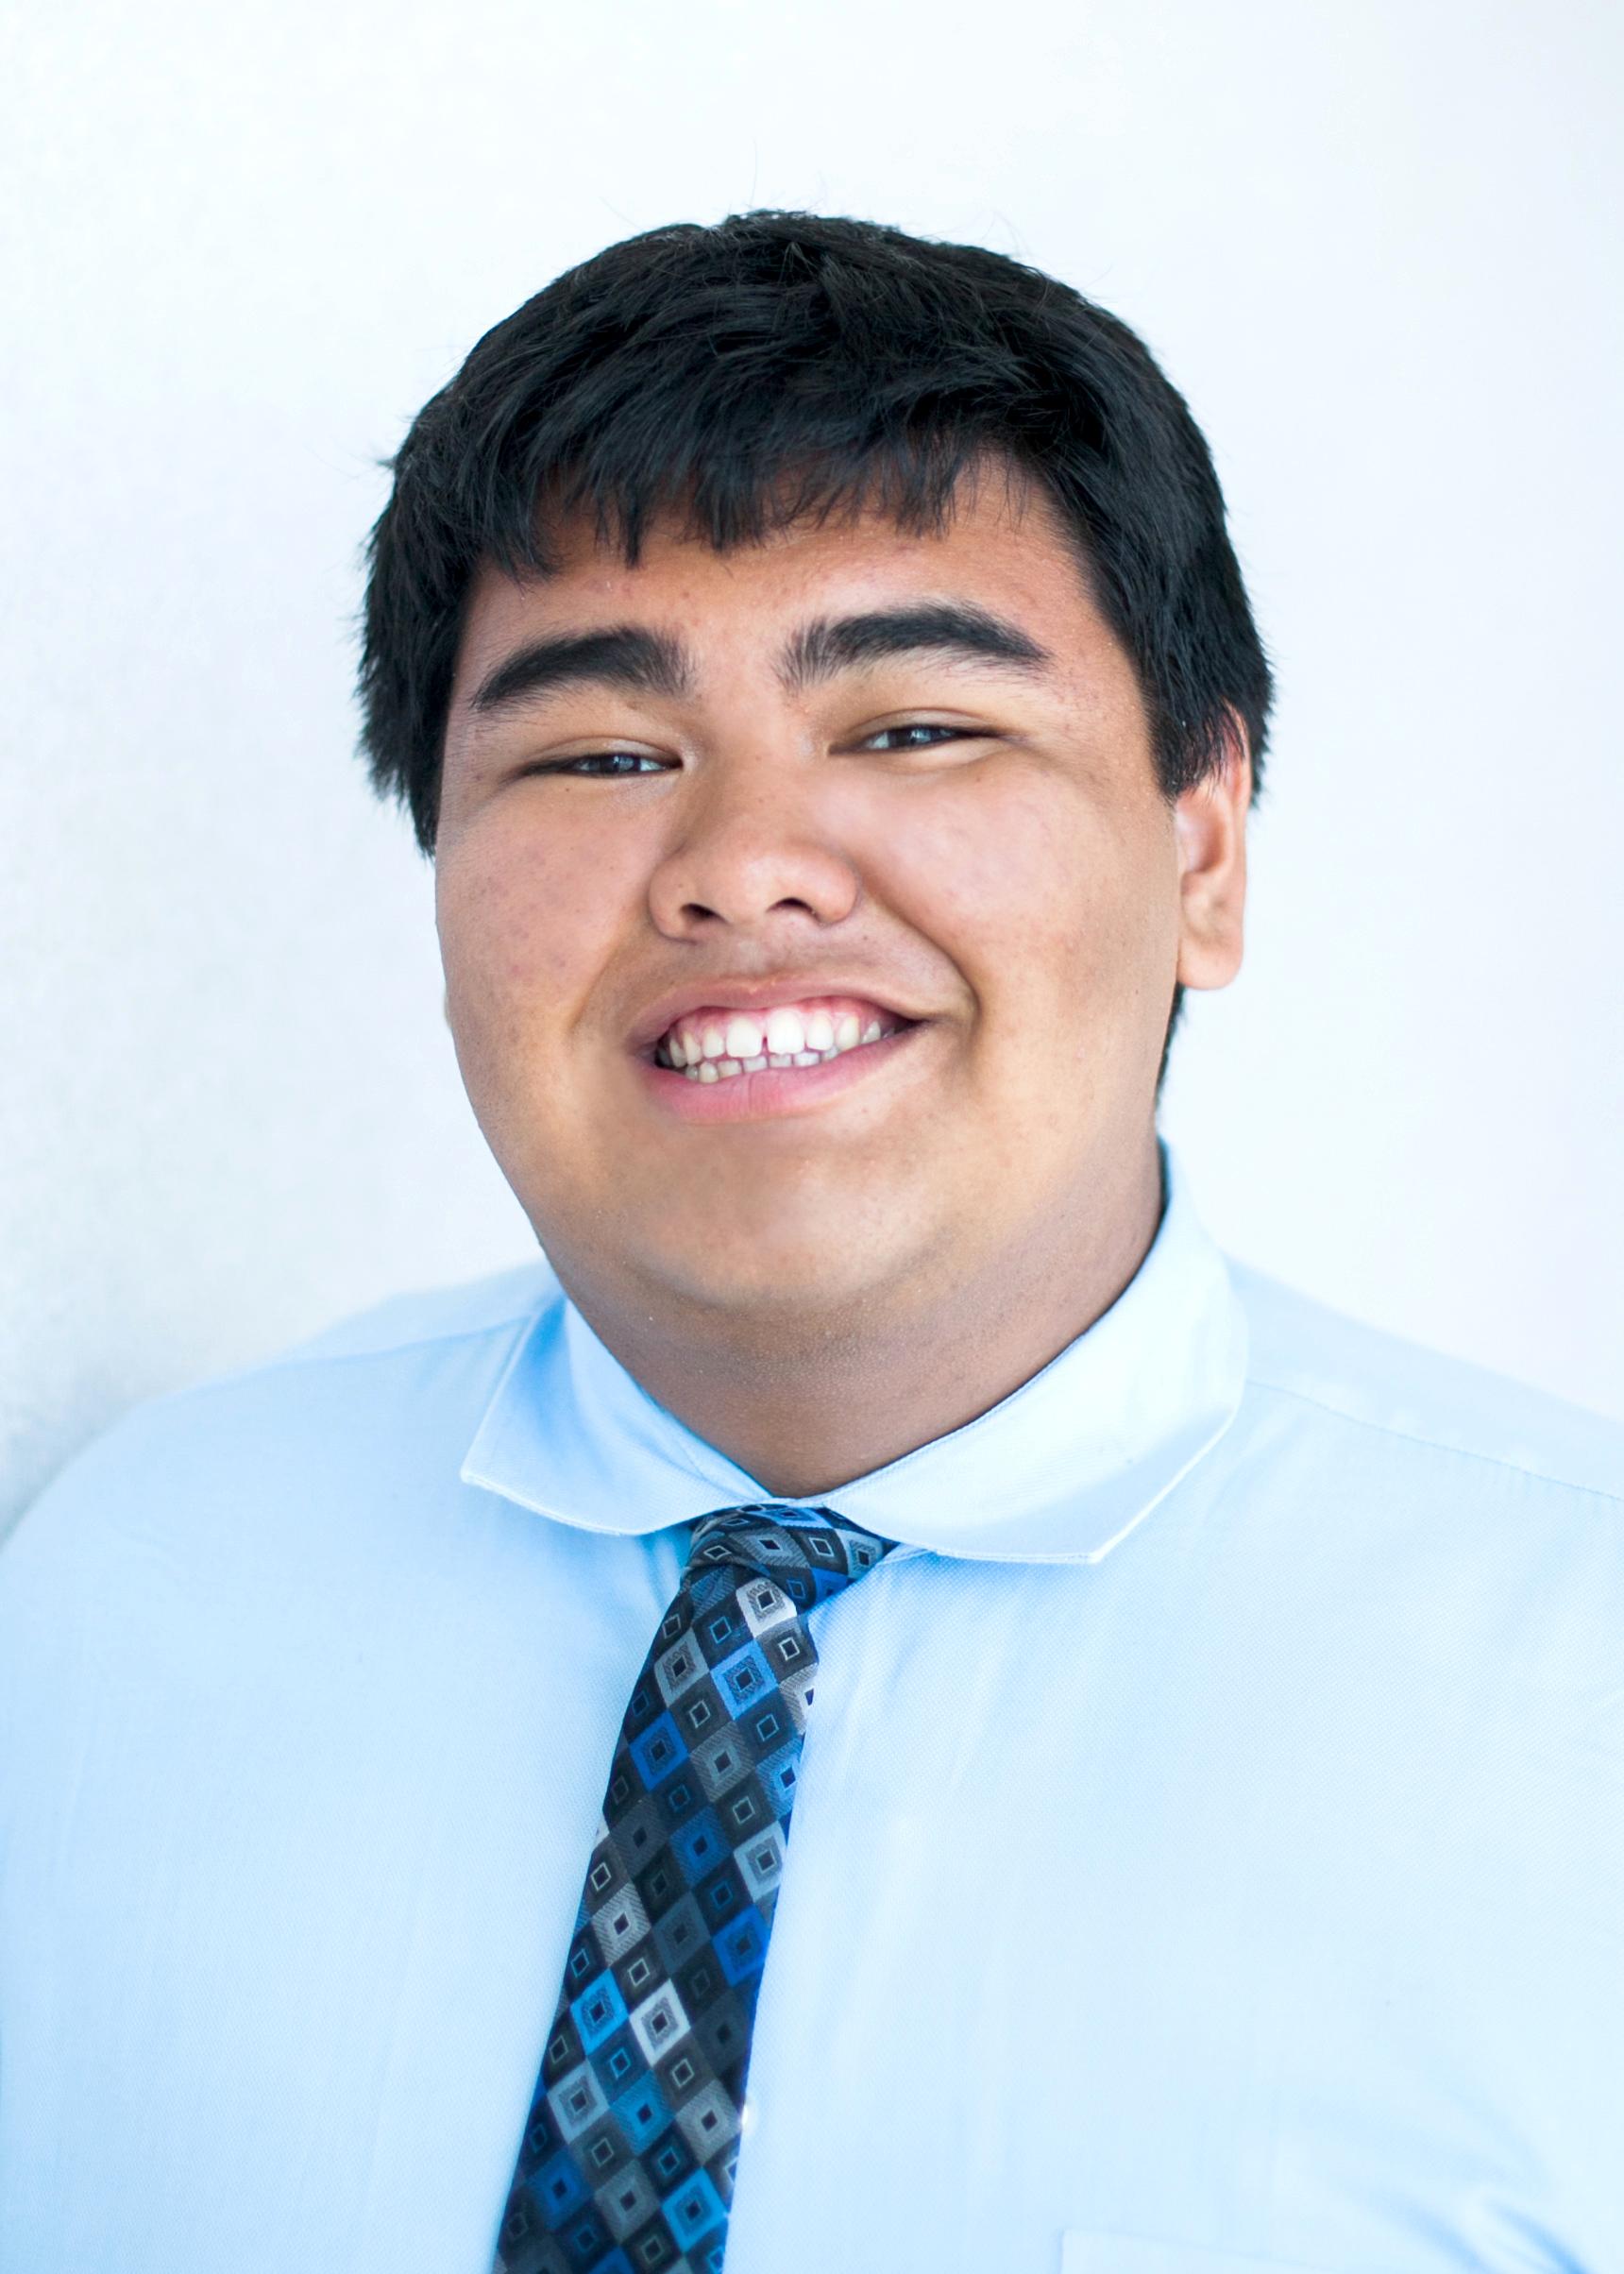 Douglas Finnegan, 2016,Kamehameha